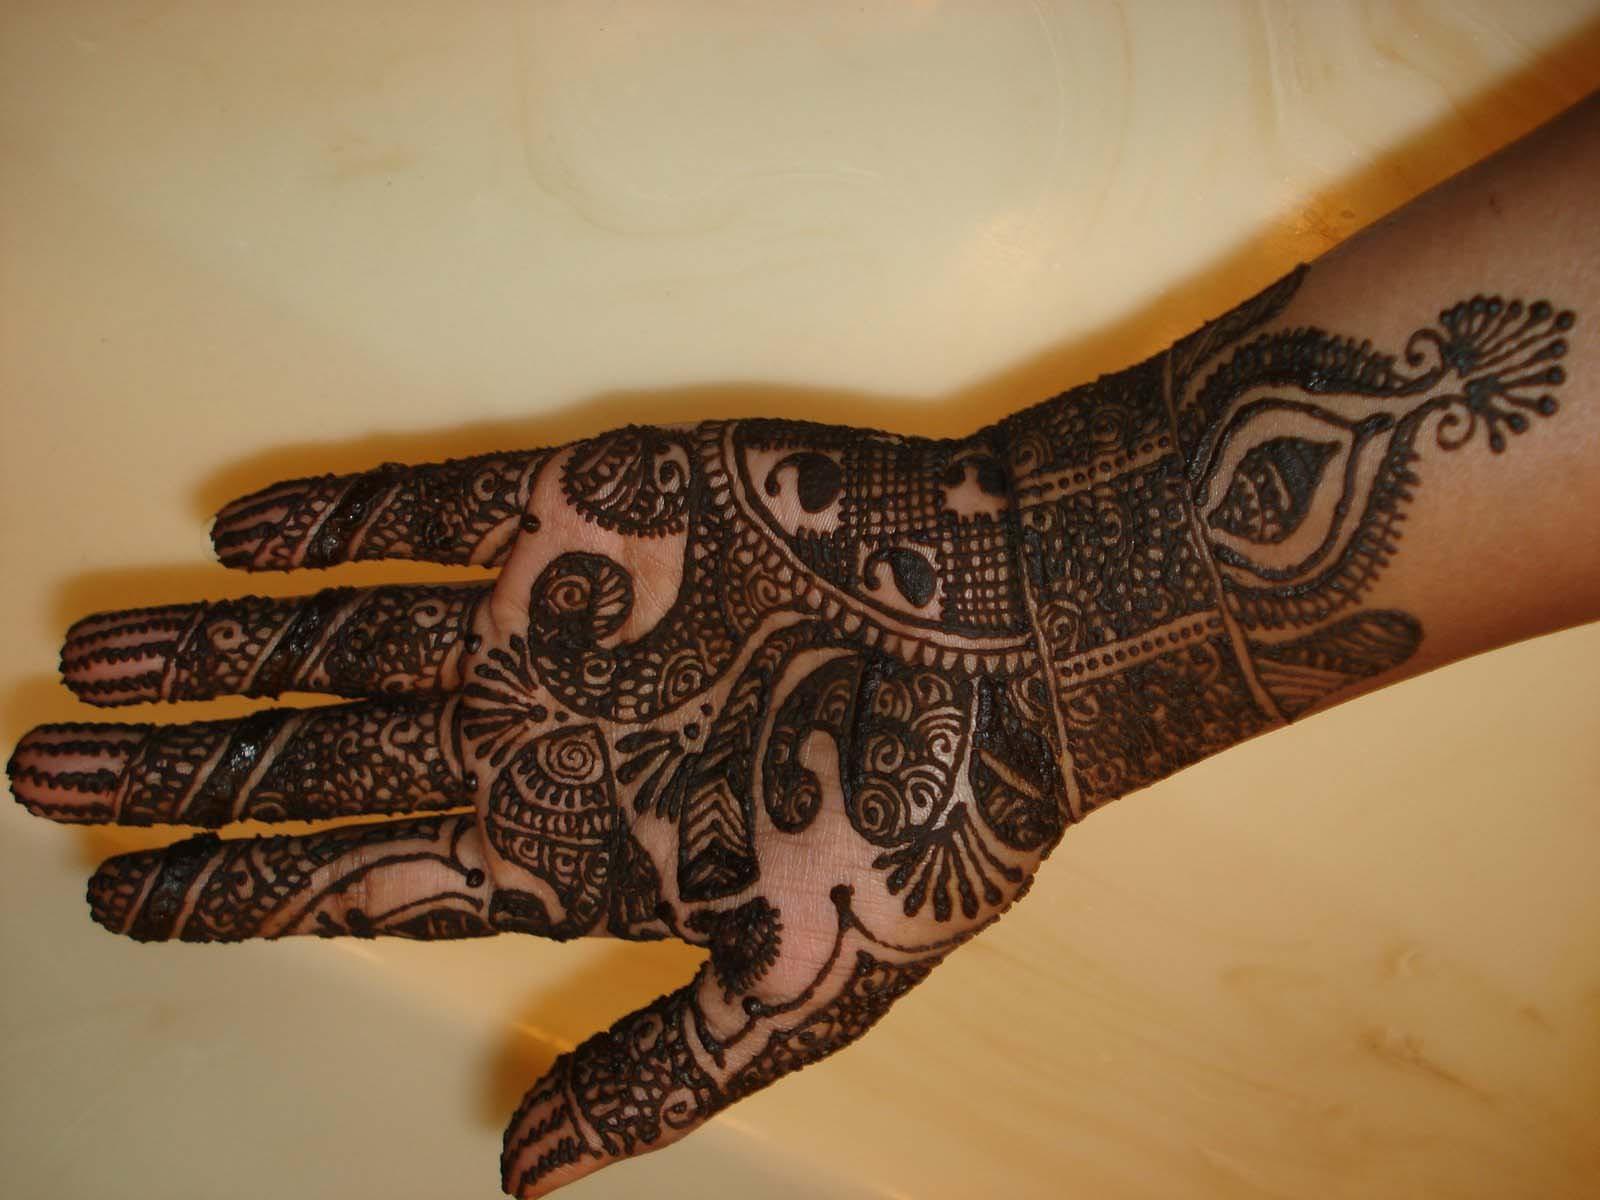 Simple Mehndi Patterns Wallpapers : Bridal mehndi designs beautiful simple design wallpapers